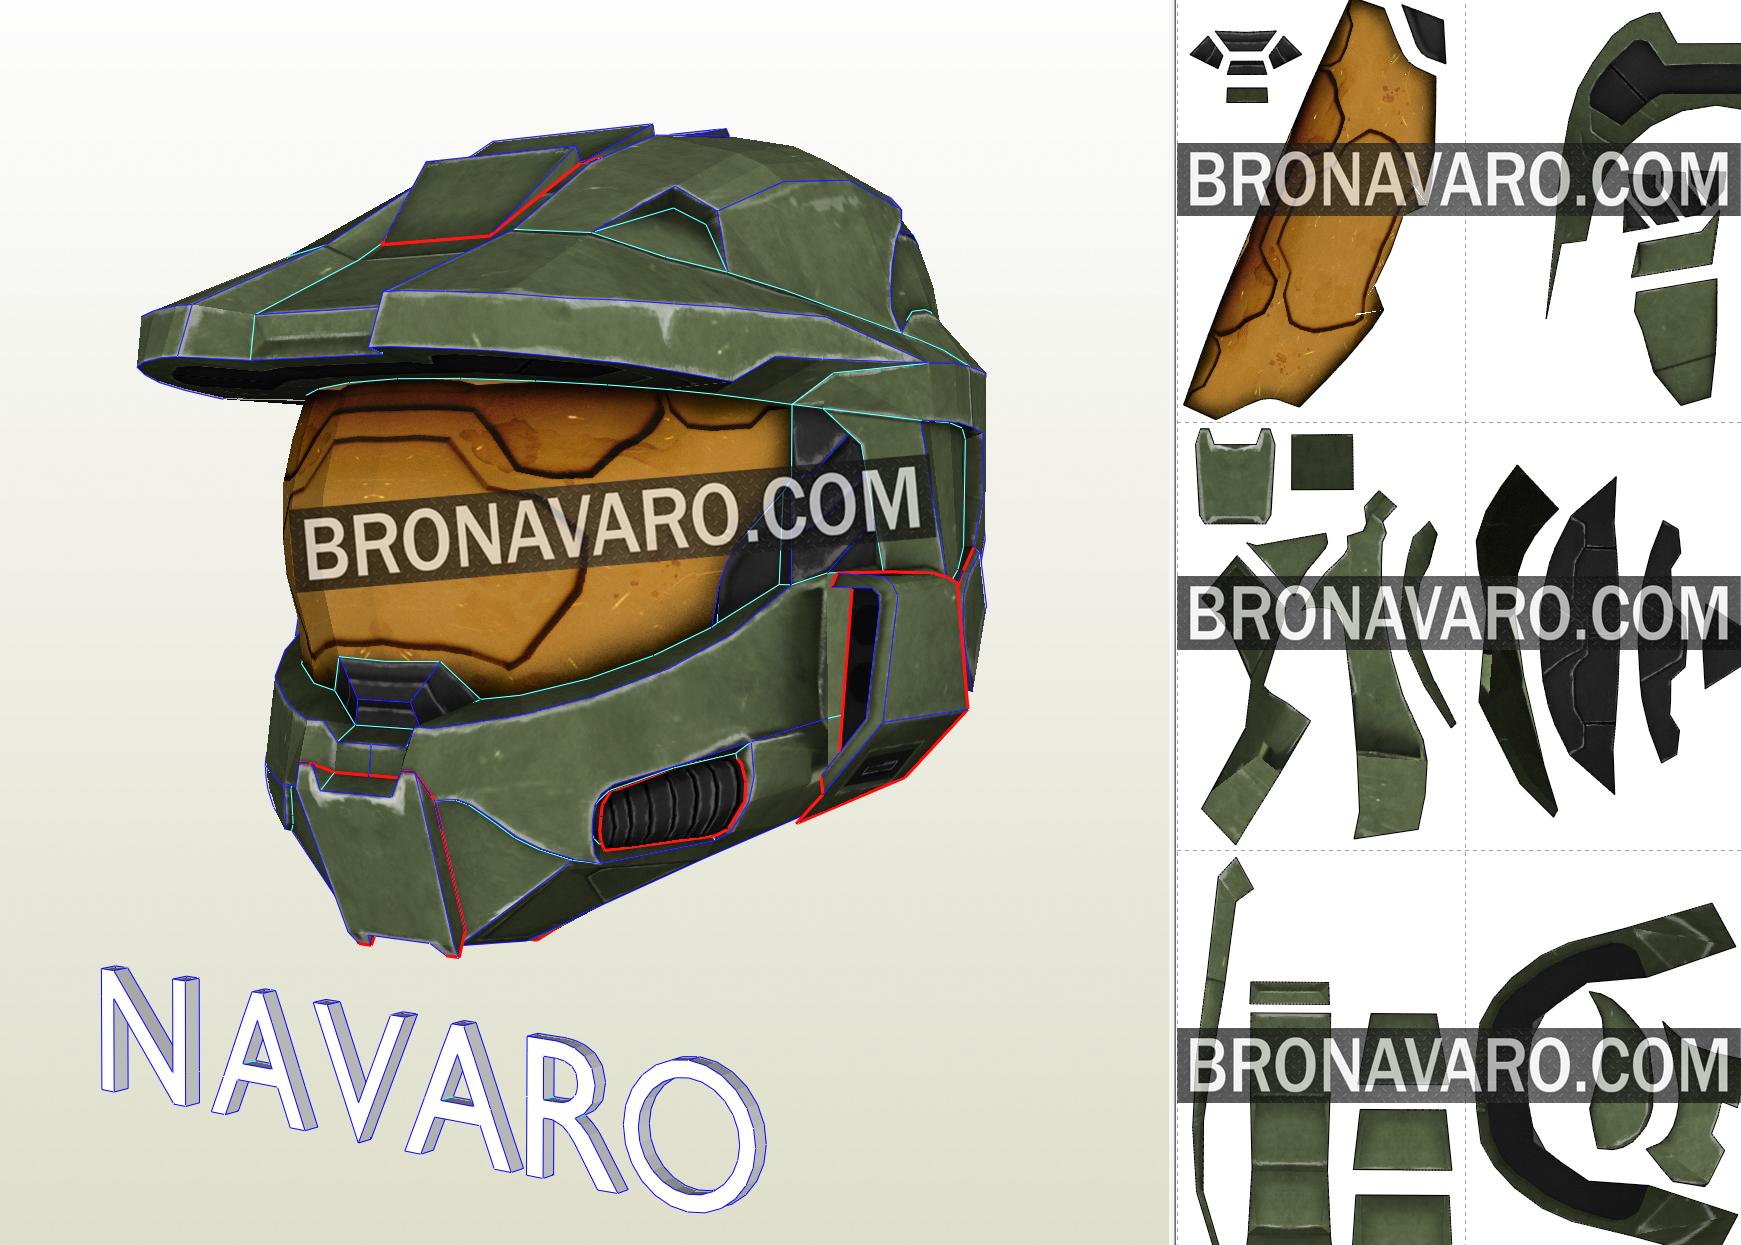 Master Chief Helmet Foam Template Halo 3 Cosplay Helmet Master Chief Helmet Pattern Halo 3 Helmet Pepakura Master Chief Armor Halo Master Chief Helmet Halo Master Chief